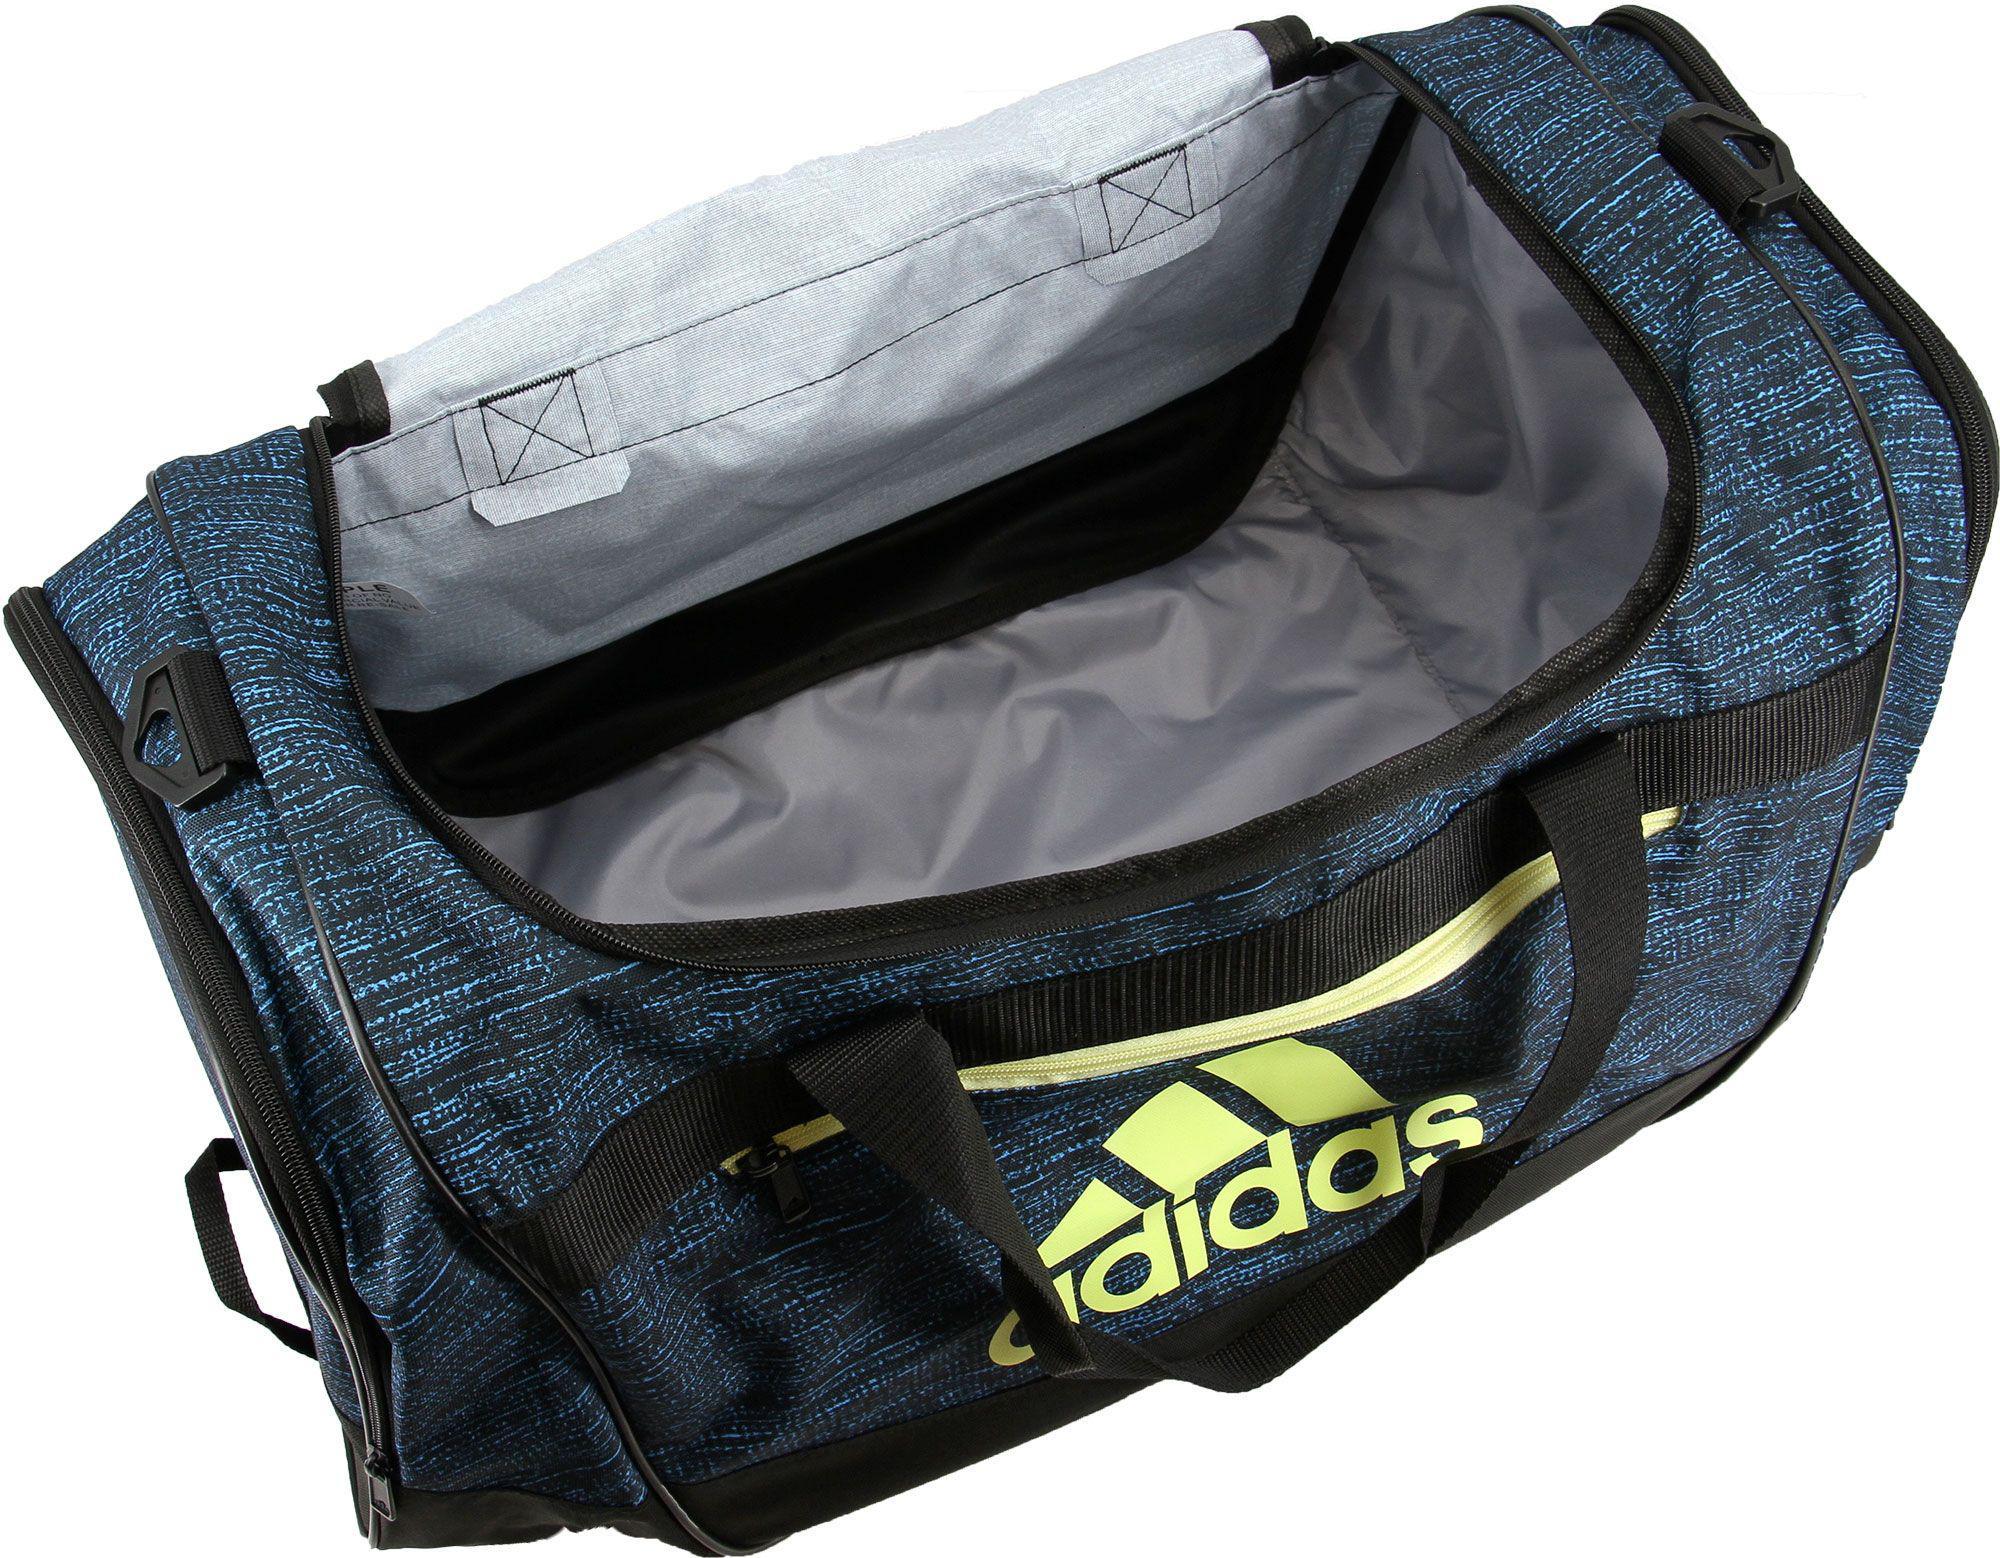 5d765ee1d7b4 ... Defender Iii Small Duffle Bag for Men - Lyst. View fullscreen